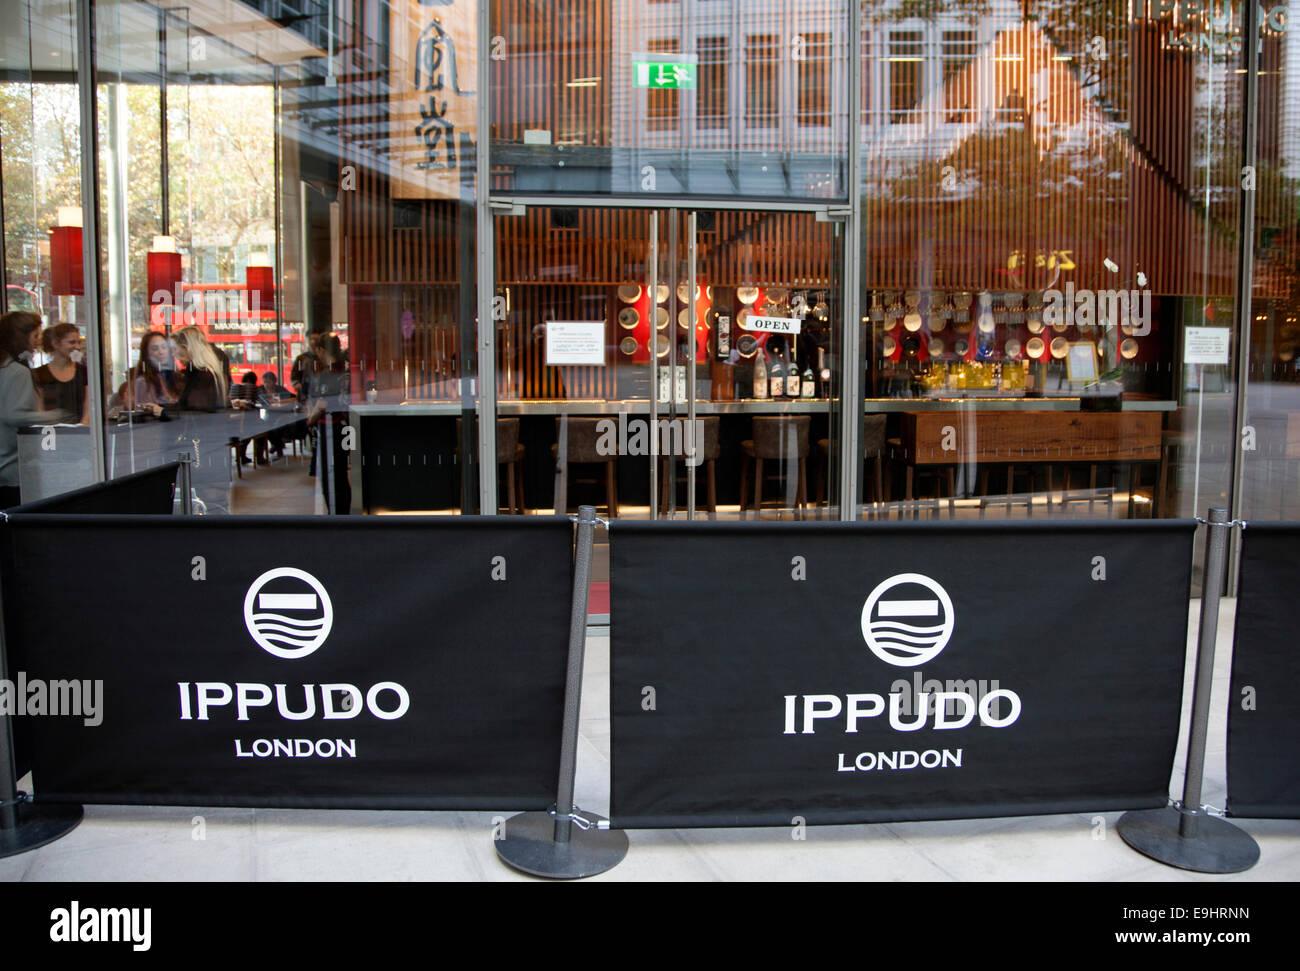 Ippudo noodles restaurant, Holborn, London - Stock Image